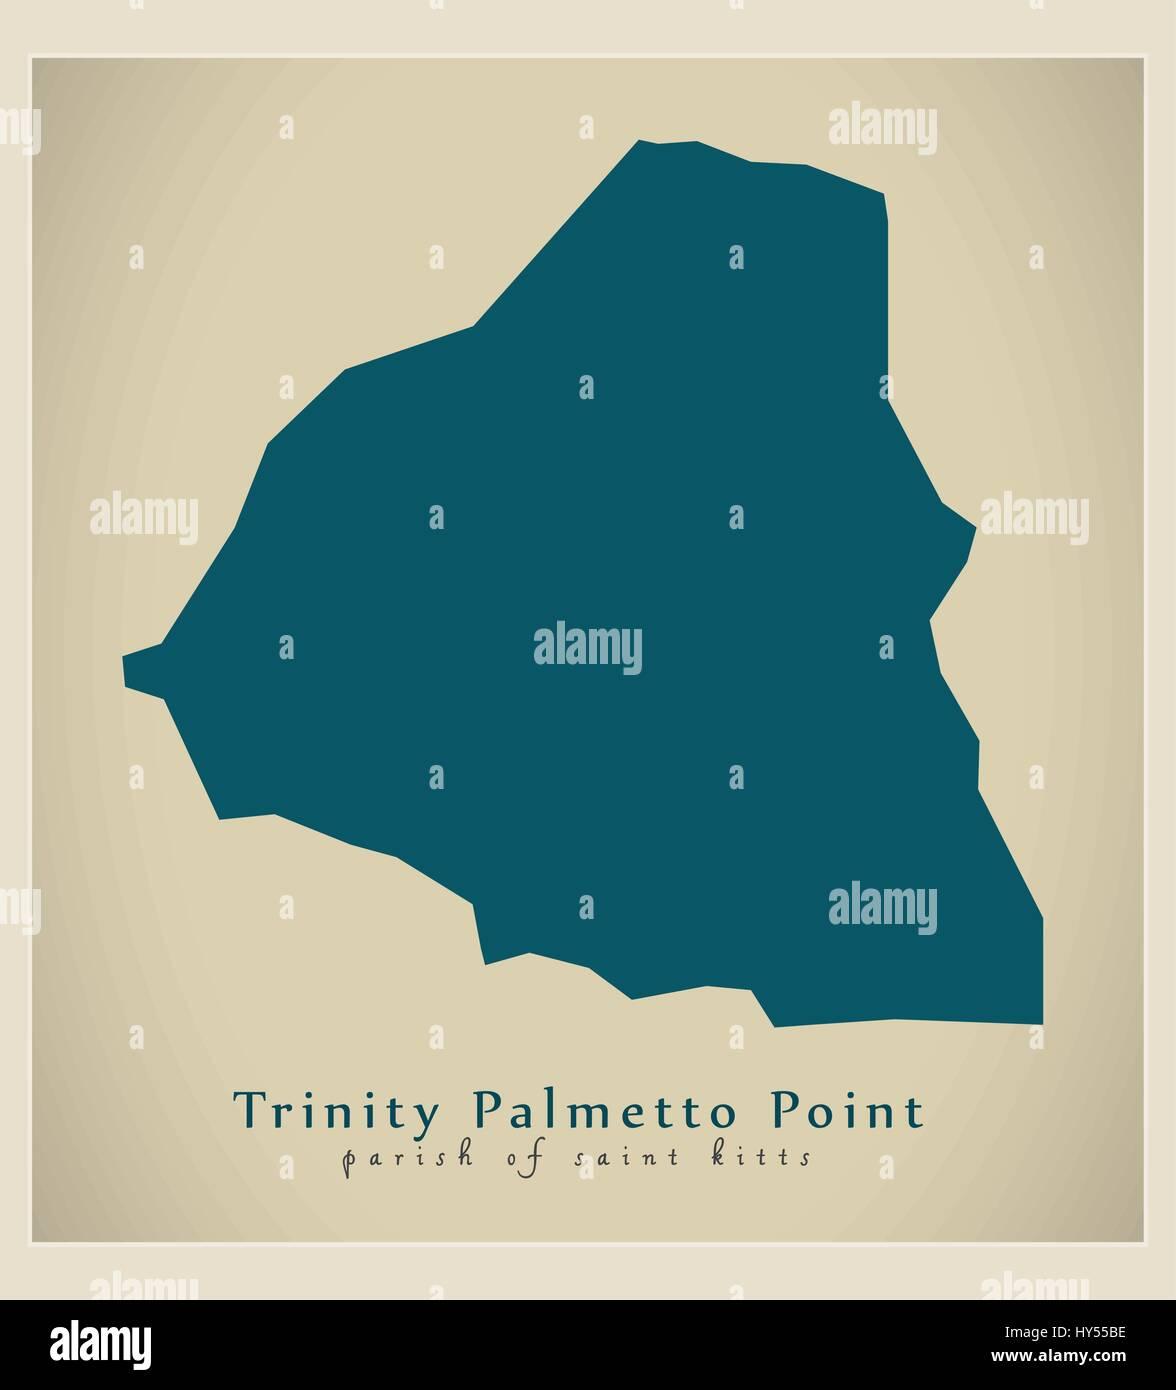 Modern Map - Trinity Palmetto Point KN - Stock Vector